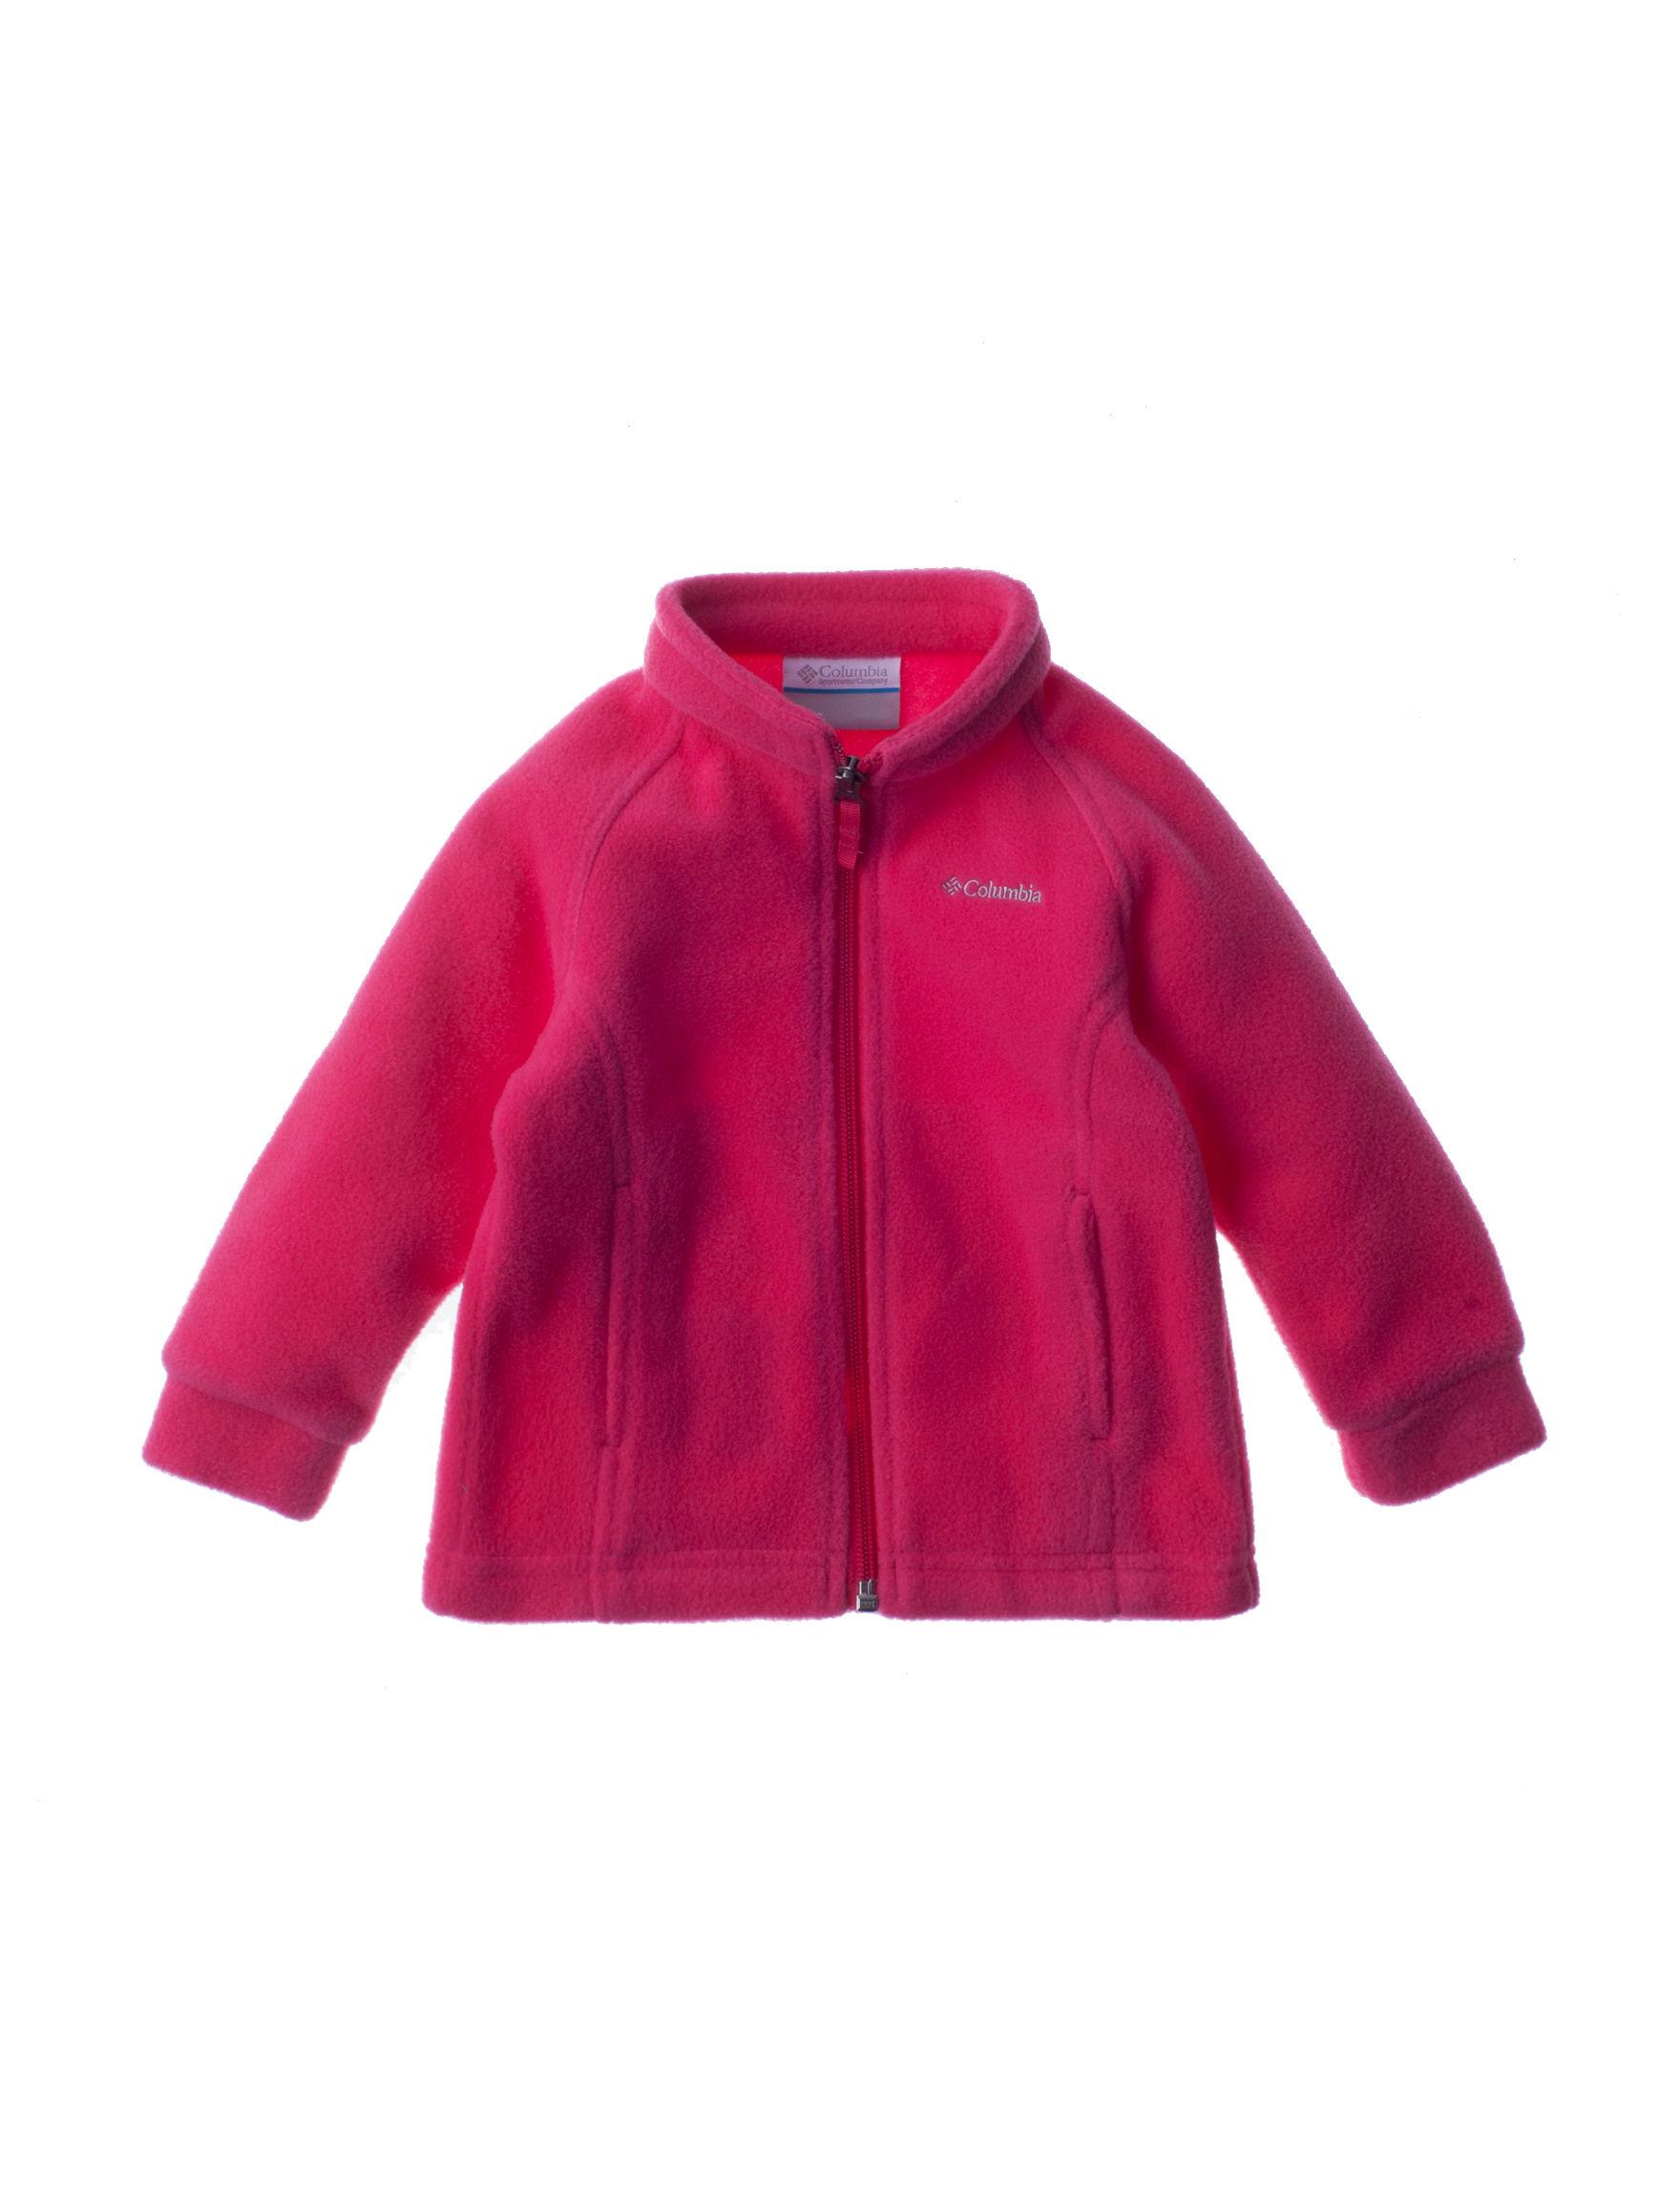 Columbia Red Lightweight Jackets & Blazers